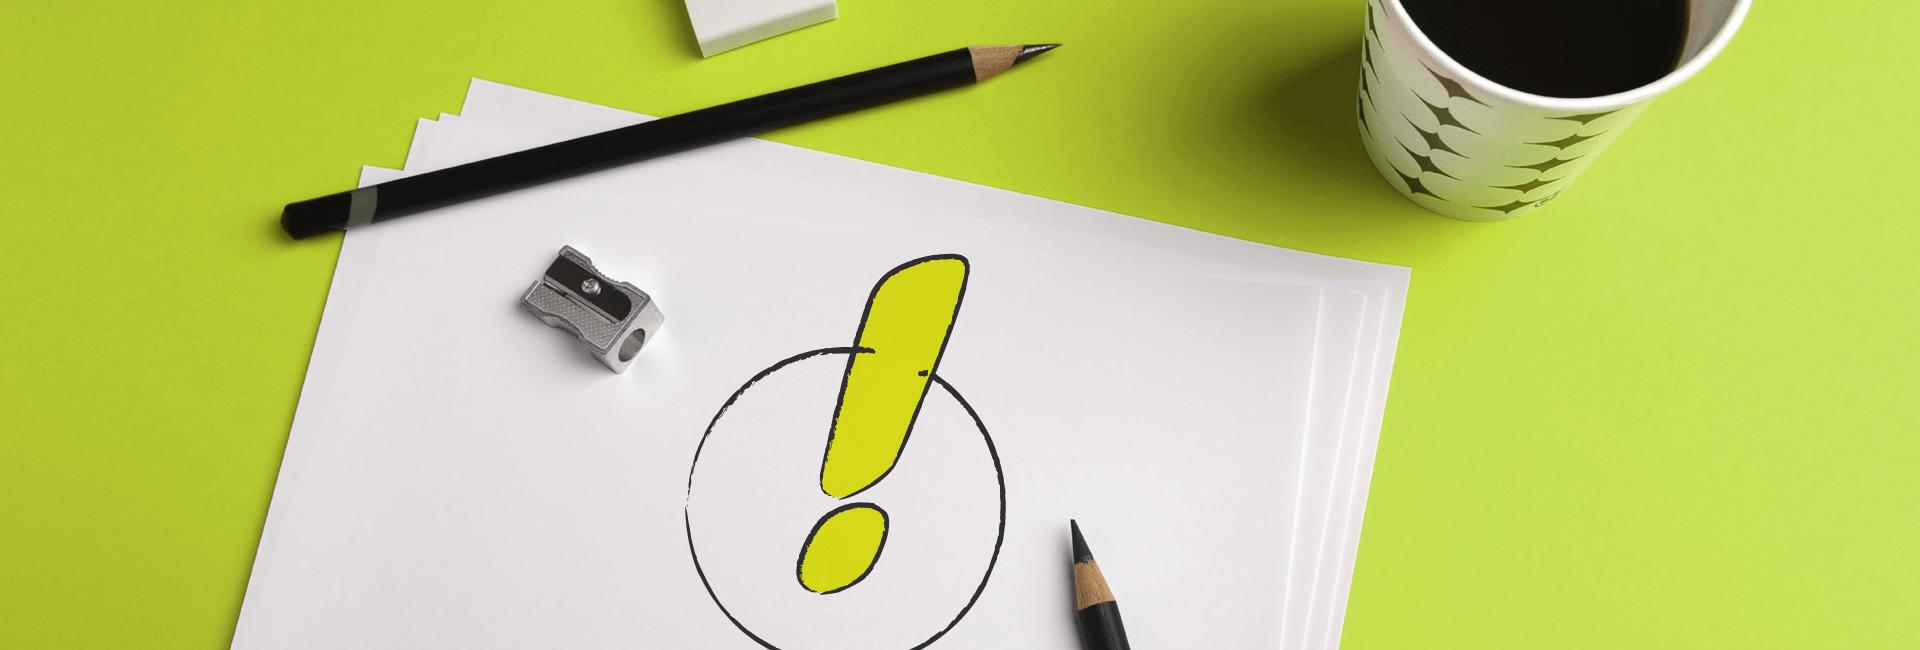 gadget Strategie + Design Werbeagentur Backnang